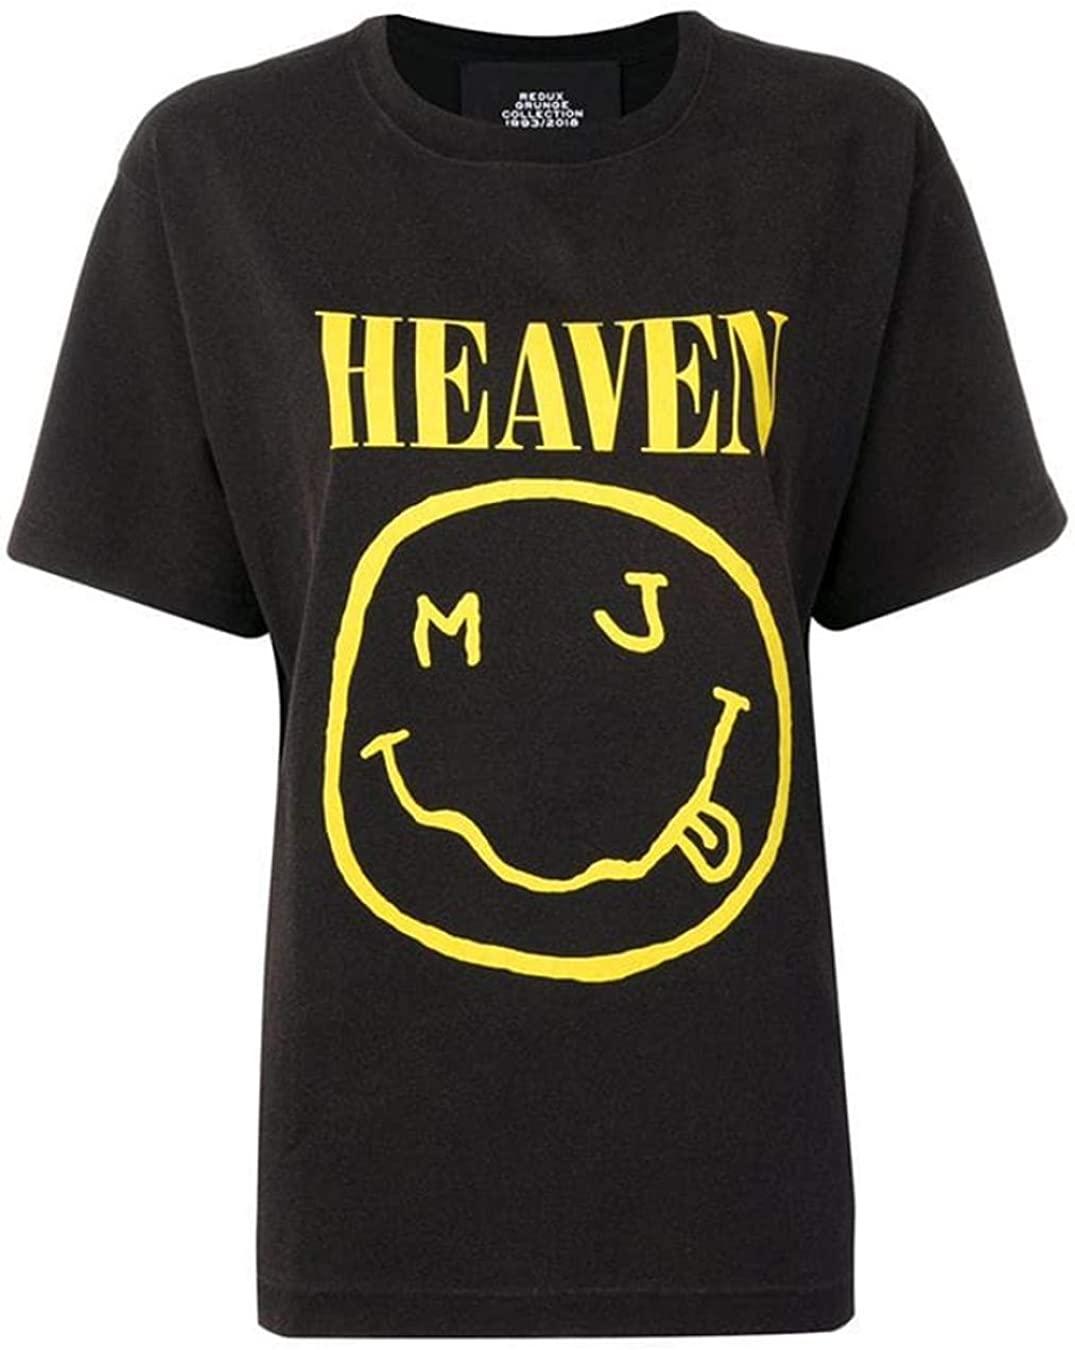 Marc Jacobs Nirvana Redux Grunge Heaven Oversize Unisex Tee Shirt